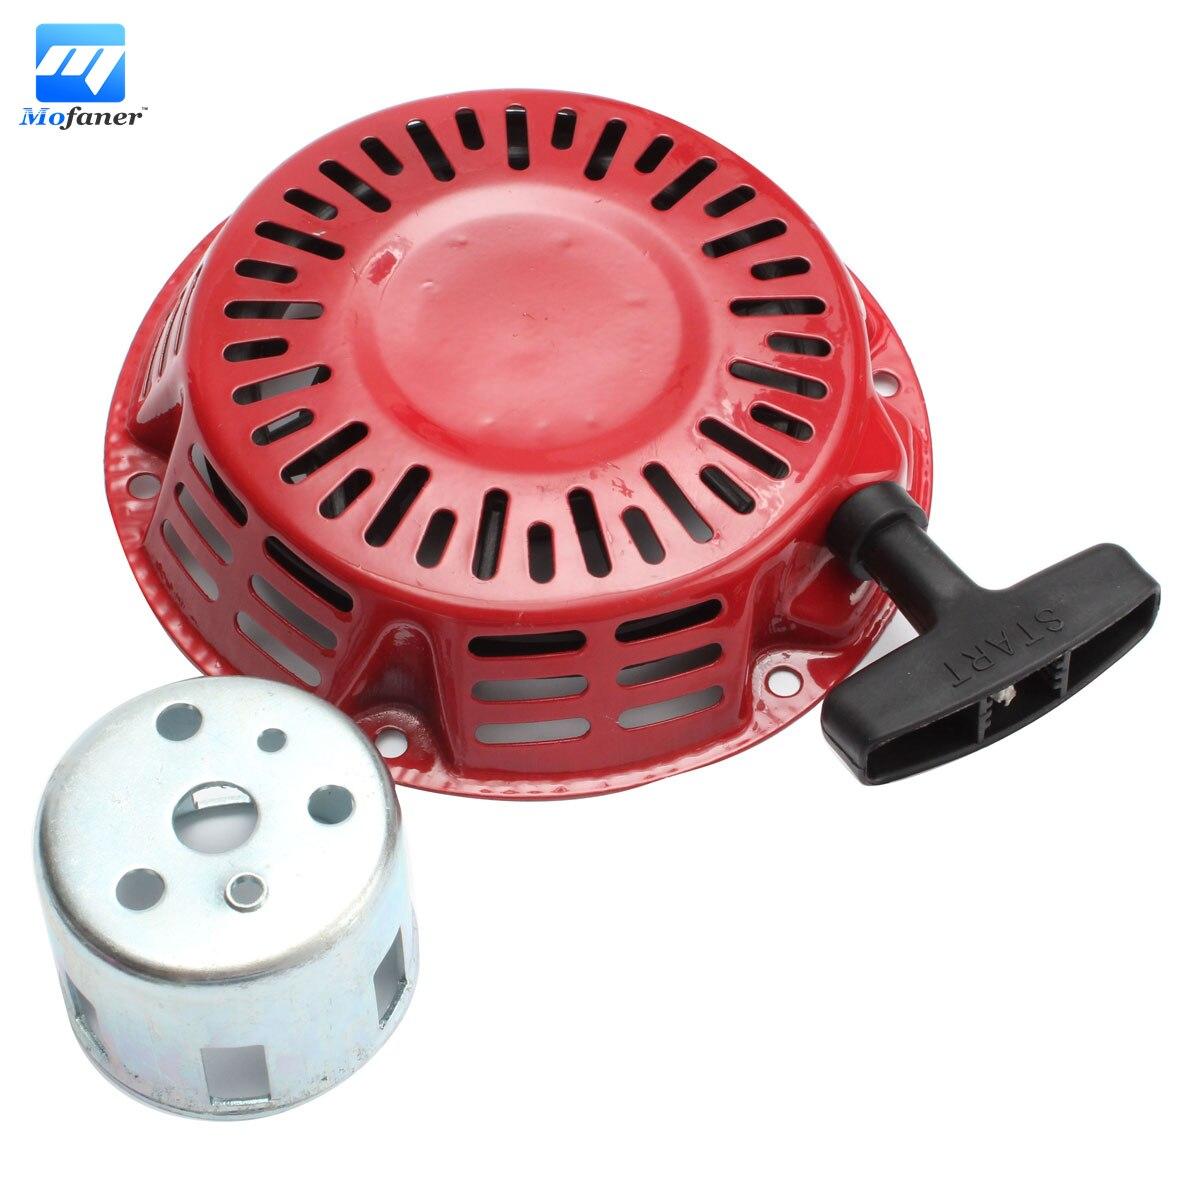 1 set Recoil Starter Cup Assembly Red Pull Start For Honda GX120 GX160 GX200 Engine g200 recoil starter for honda g150 gv150 gv200 4hp 6 5hp steel ratchet rewind pull start handle rope assembly